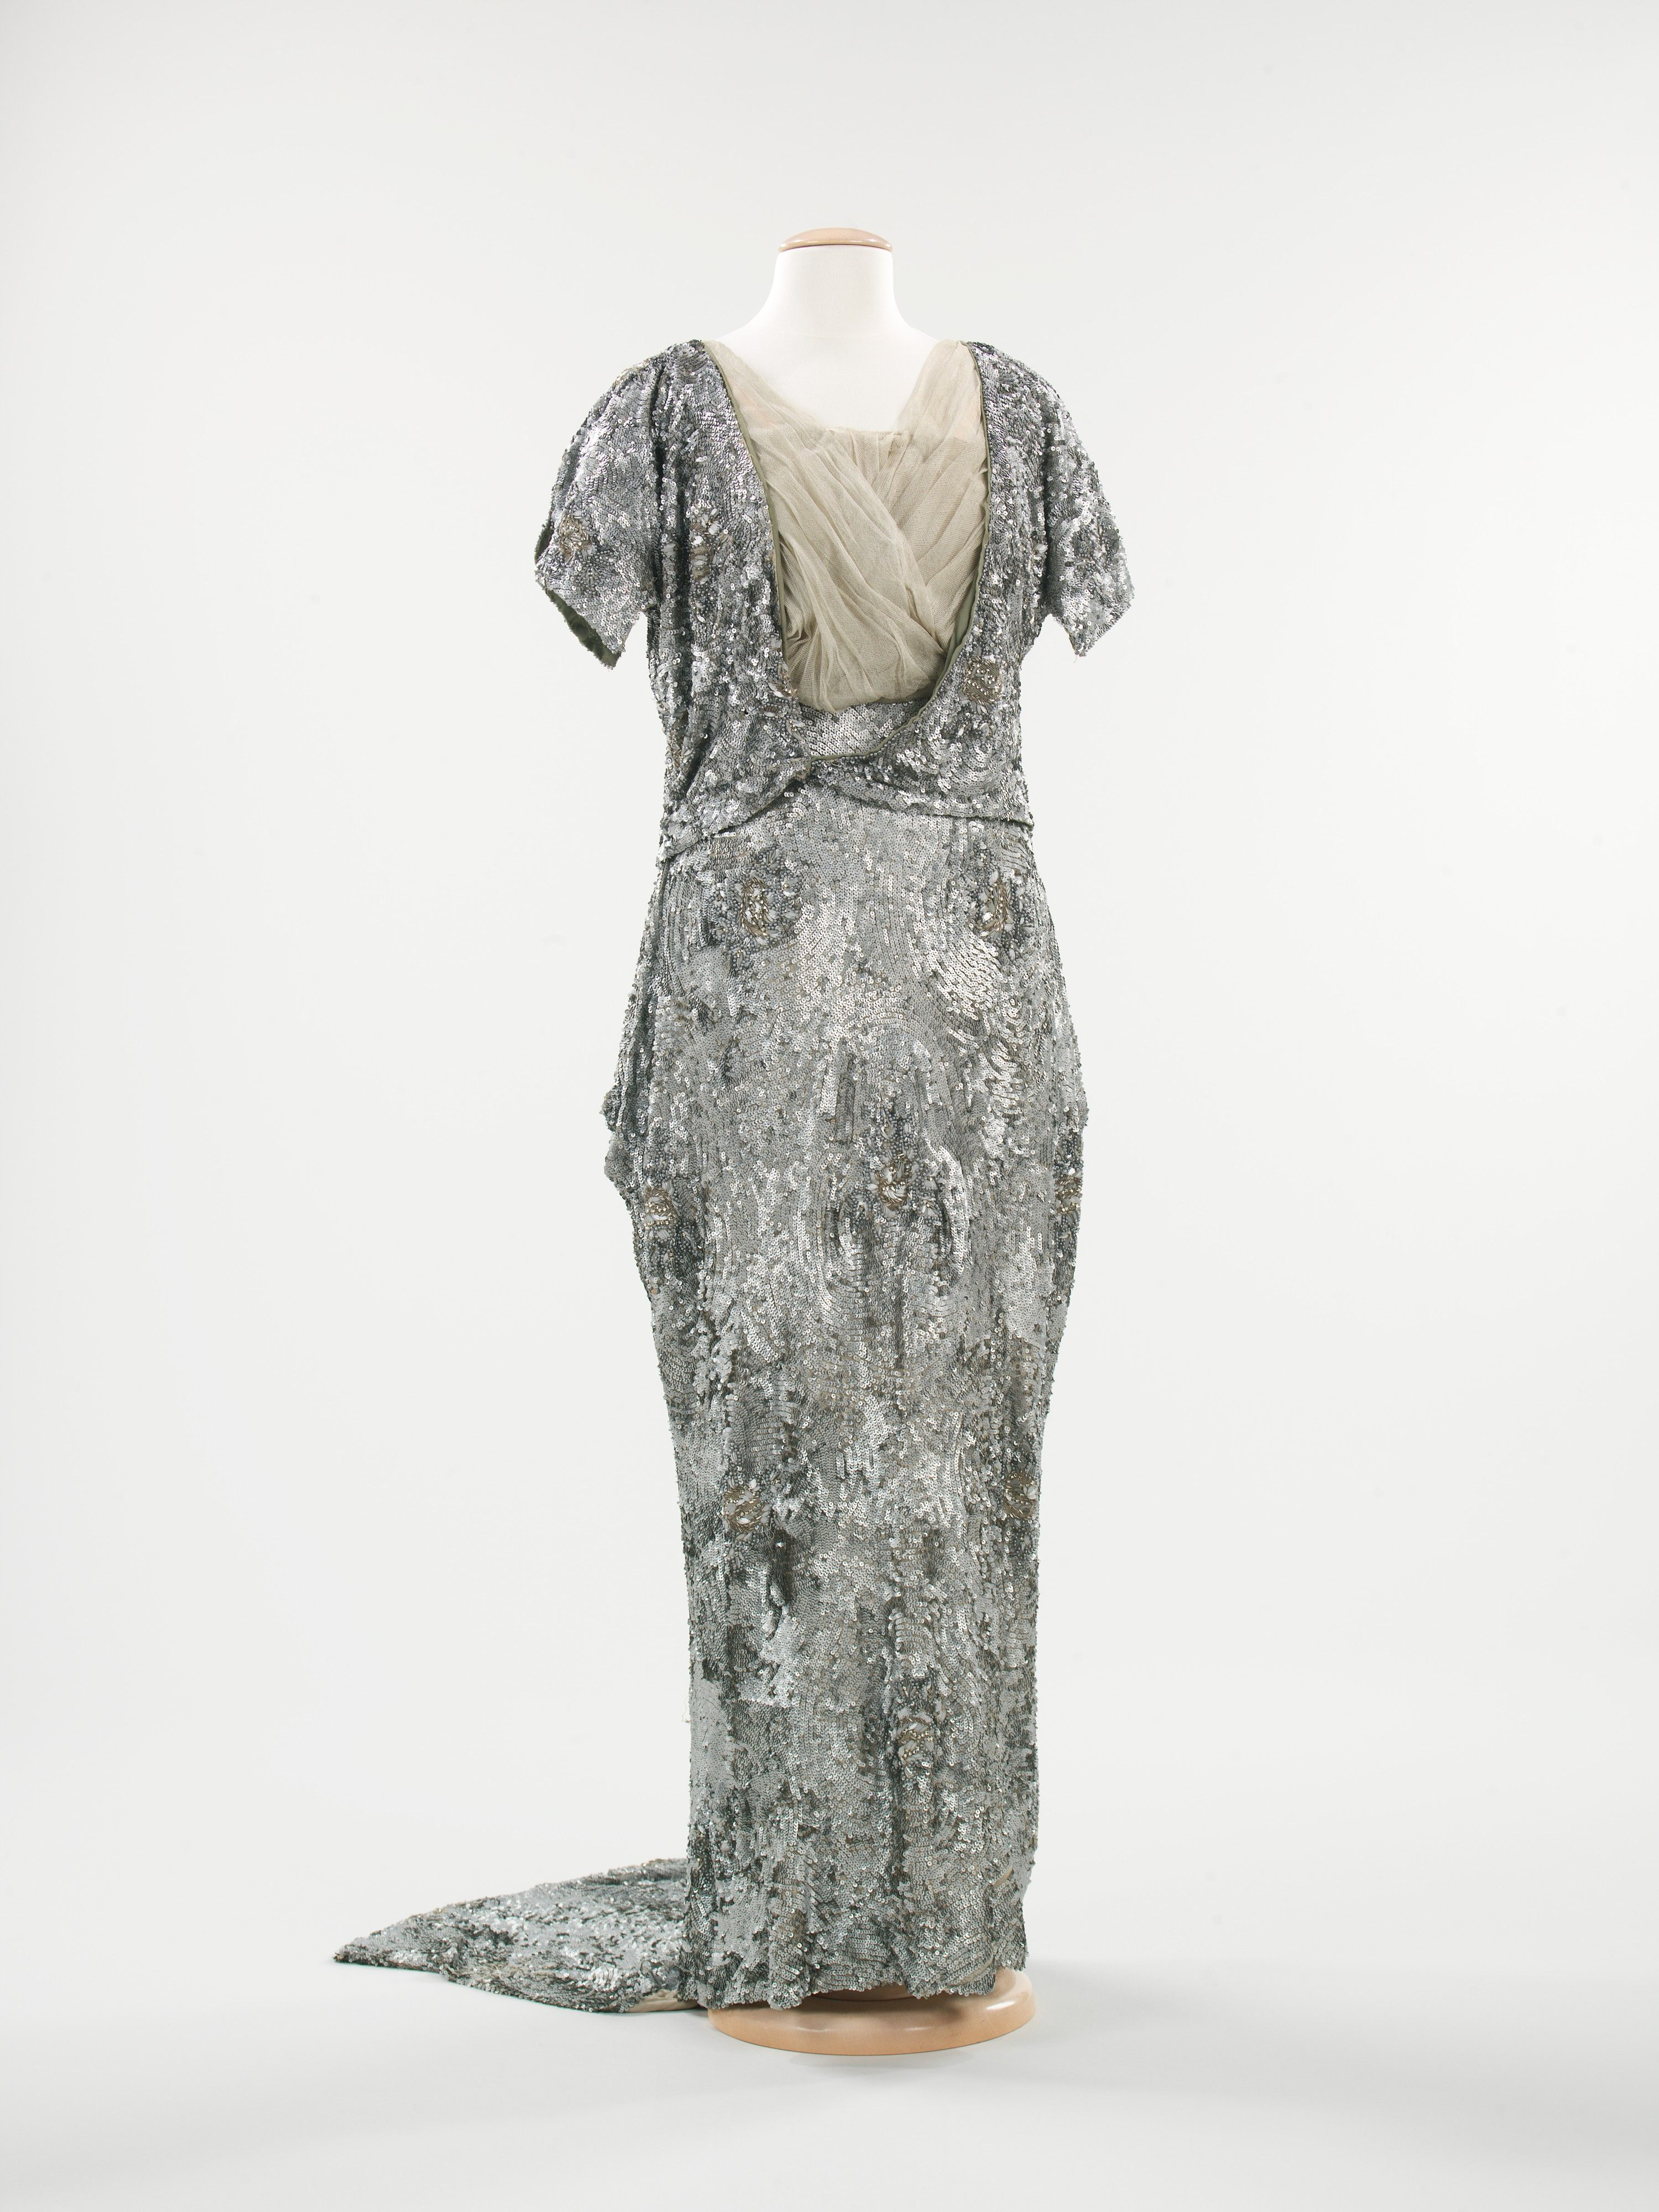 Evening Dress: ca. 1915, American, silk, metallic sequins ...